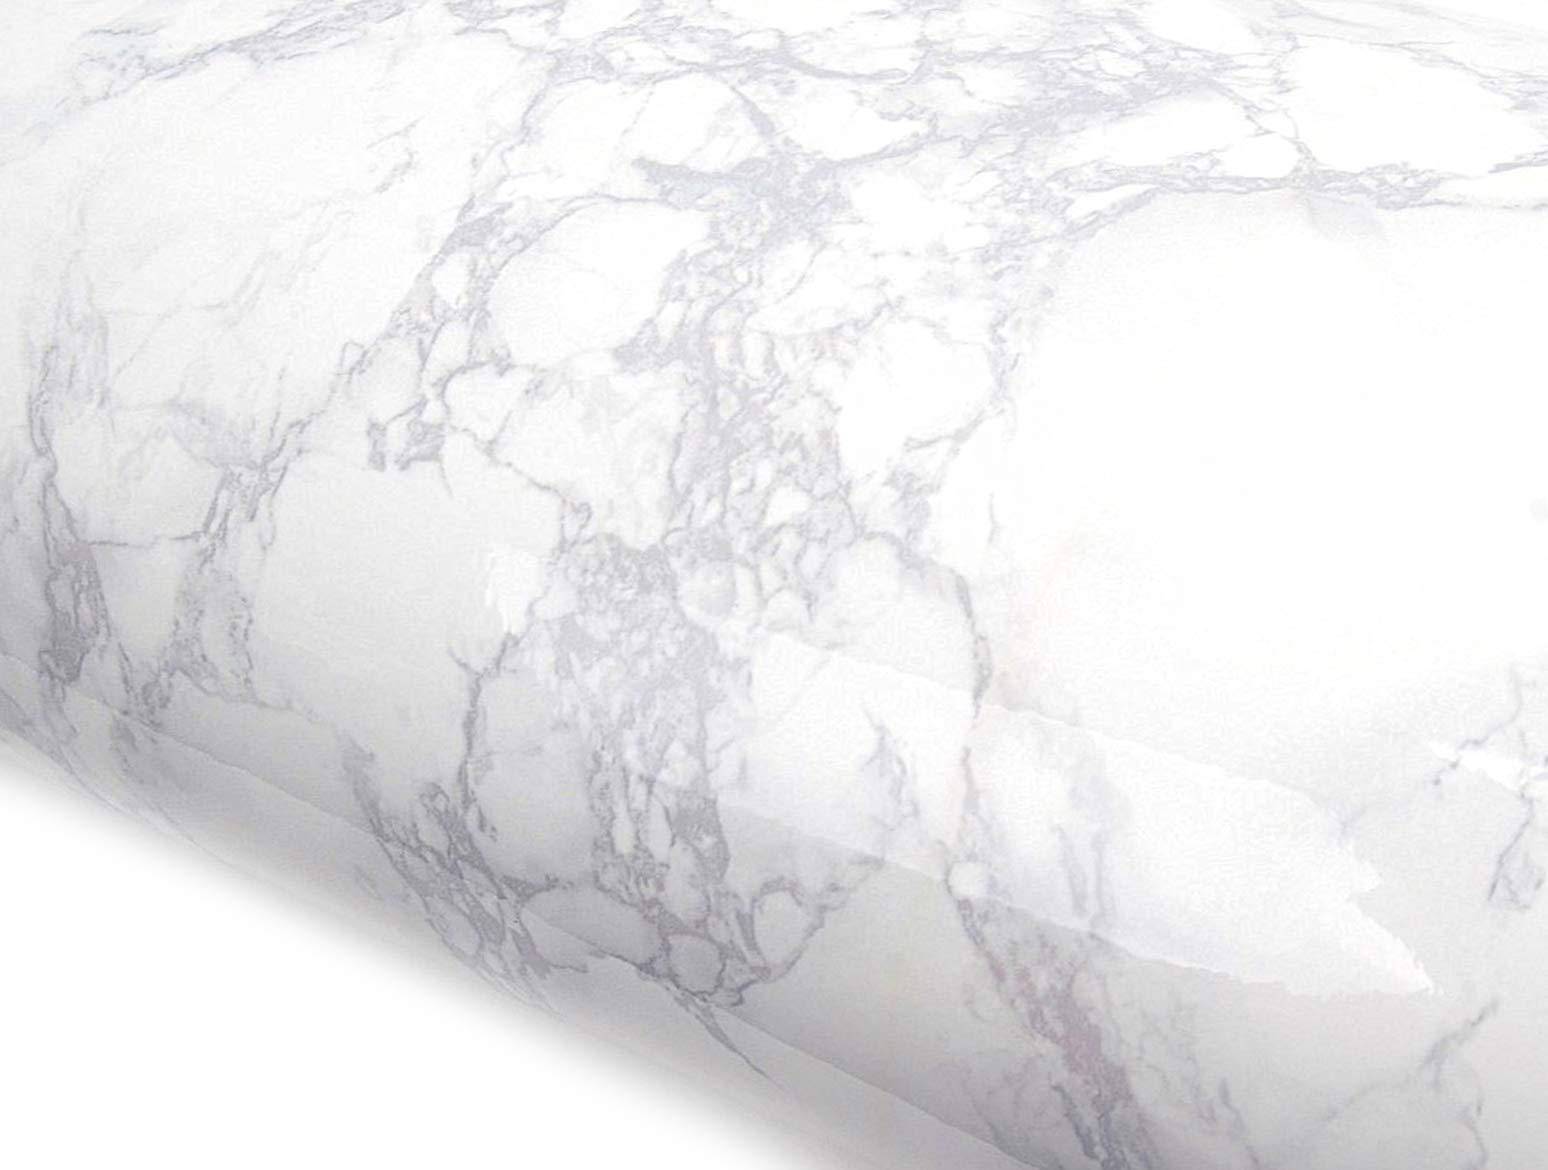 Peel and Stick PVC Instant Marble Decorative Self-Adhesive Film Countertop Backsplash Napoleon Marble (PGS408 2.00 feet X 6.56 feet) by ROSEROSA